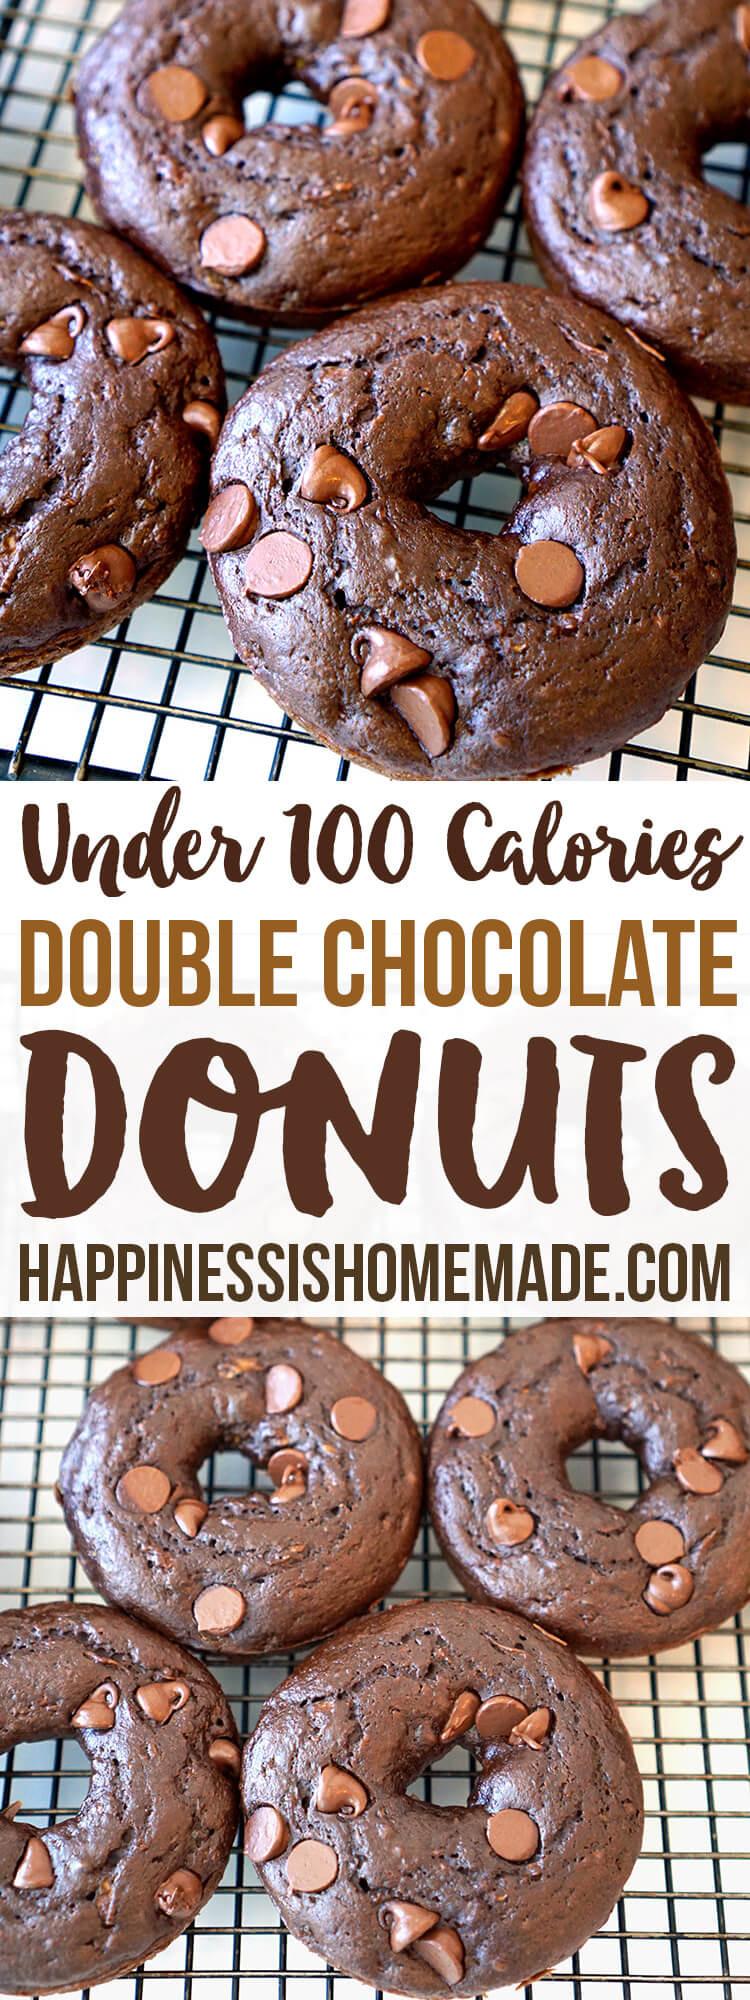 Healthy Chocolate Zucchini Cake  Double Chocolate Zucchini Cake Donuts Happiness is Homemade